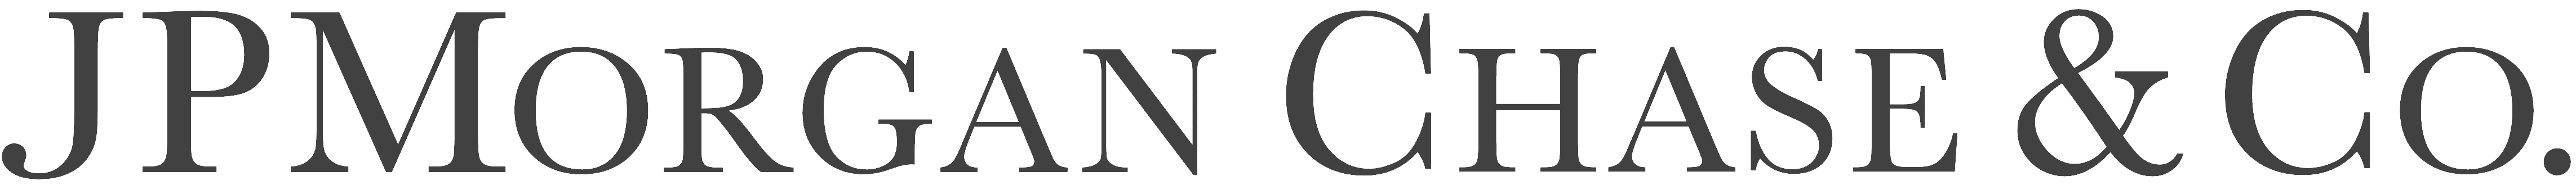 JPMorgan_Chase_logo_gray